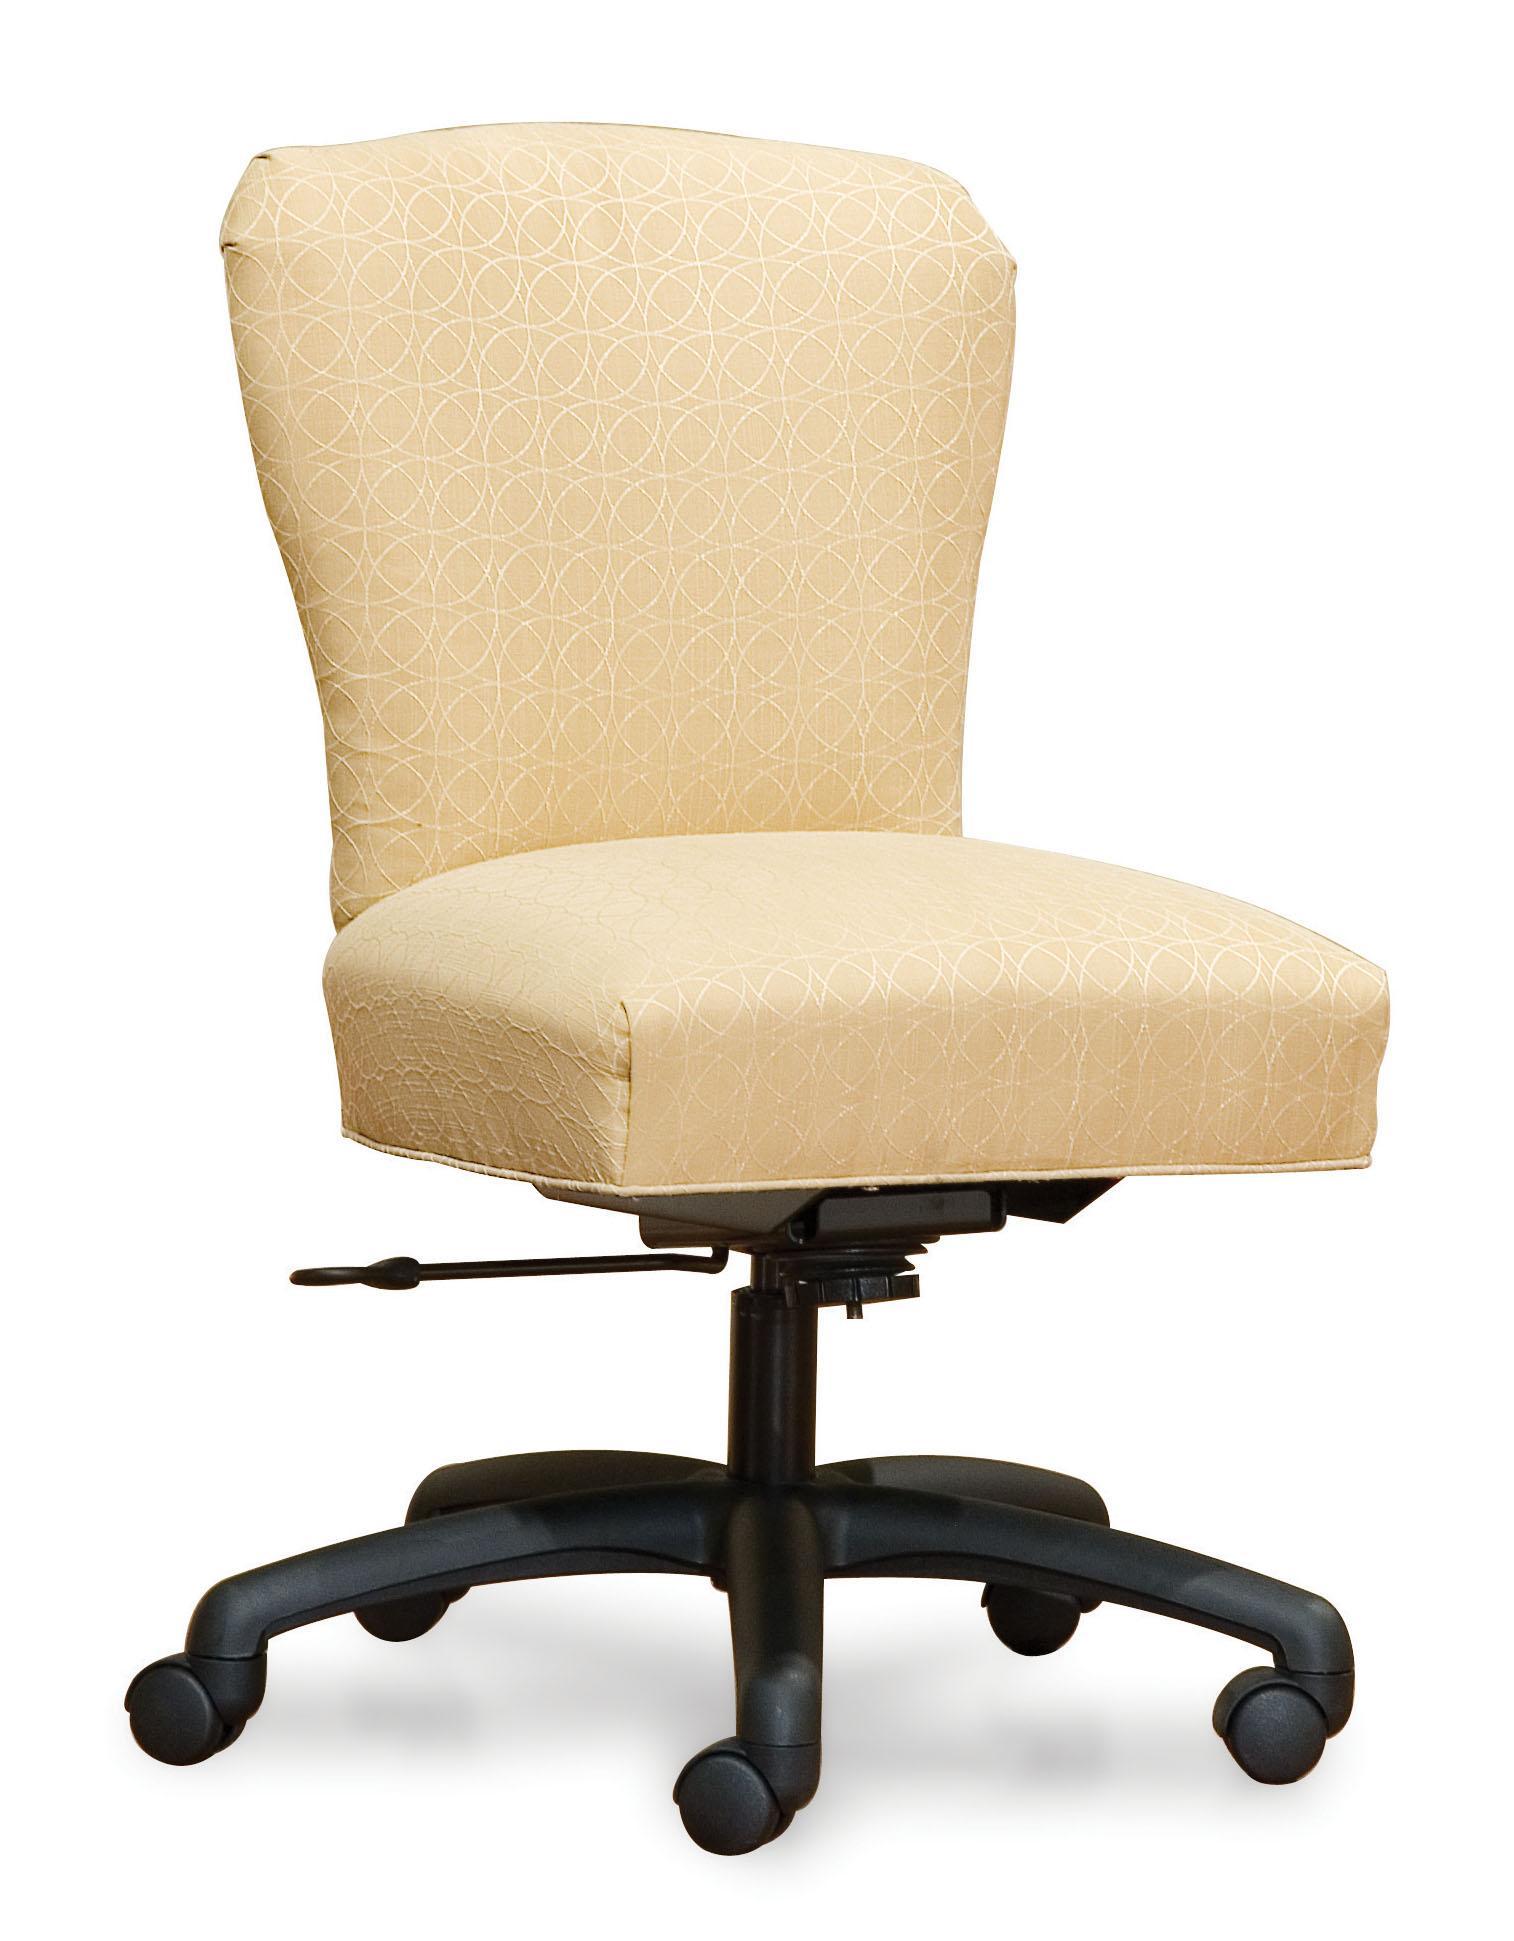 Fairfield Office FurnishingsSwivel Task Chair